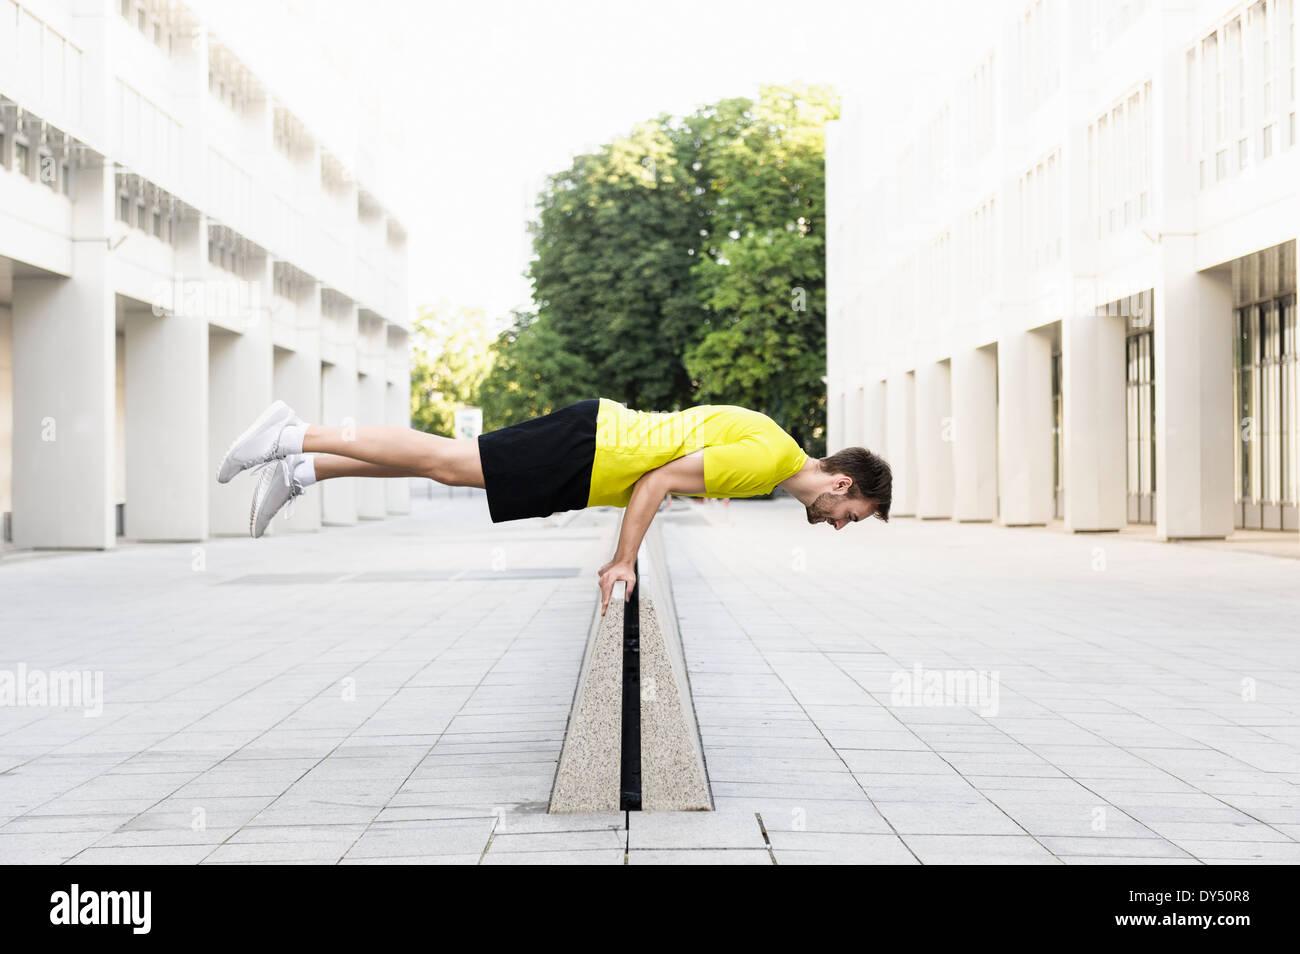 Junger Mann balancieren horizontal auf Teiler Stockbild